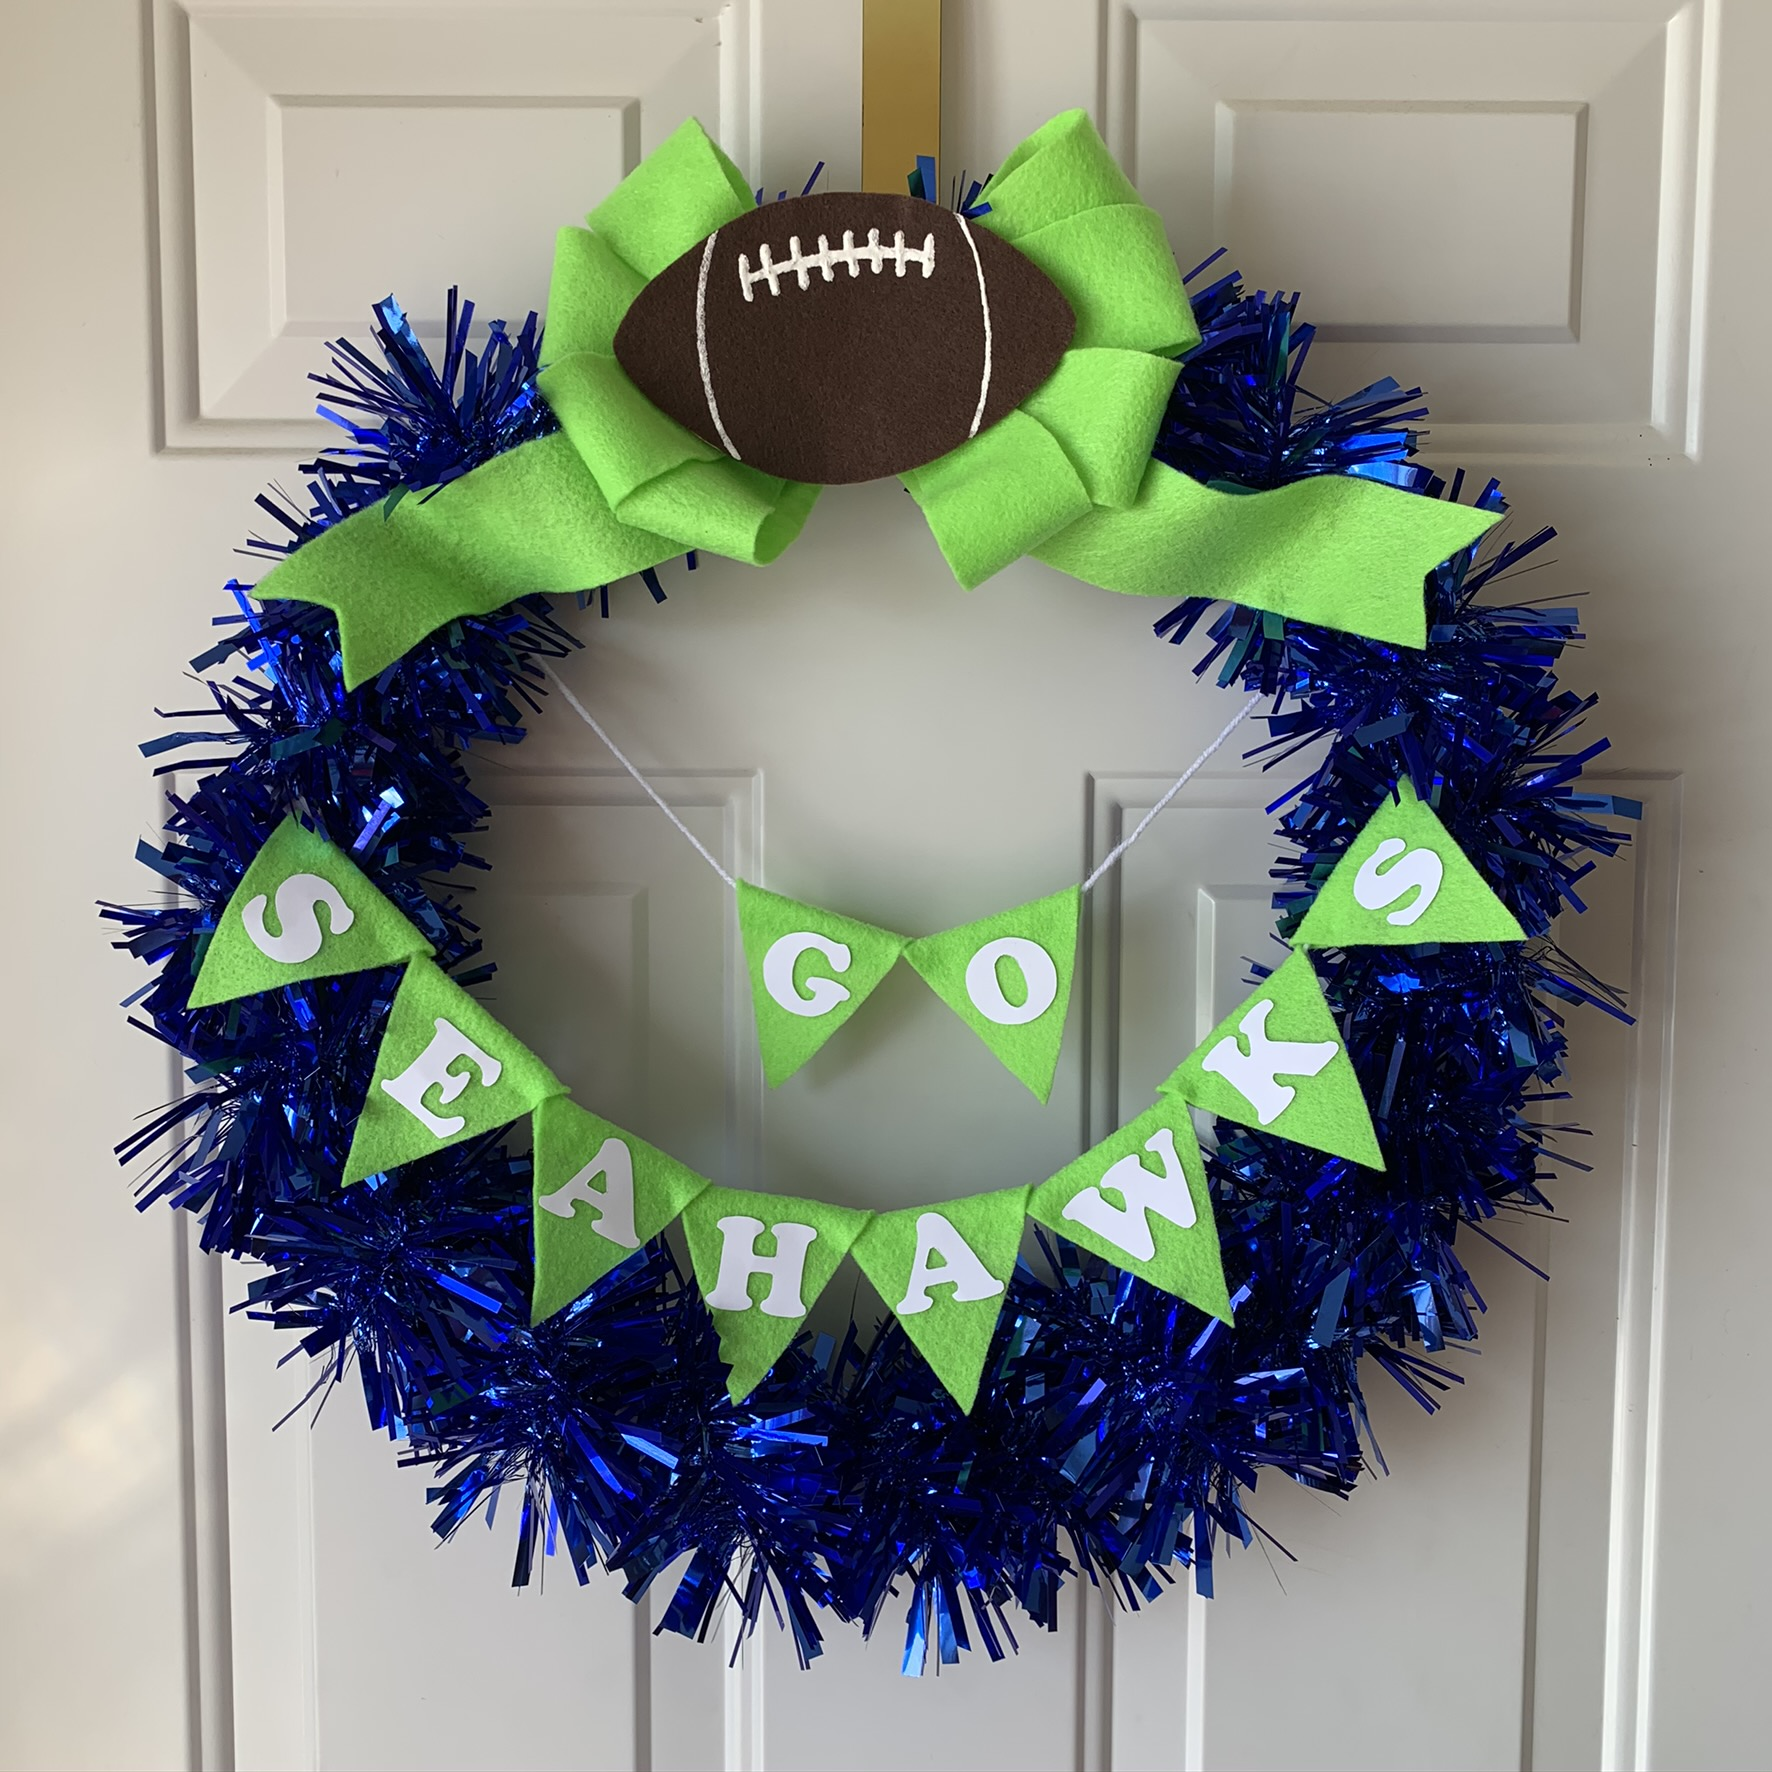 DIY Team Wreath